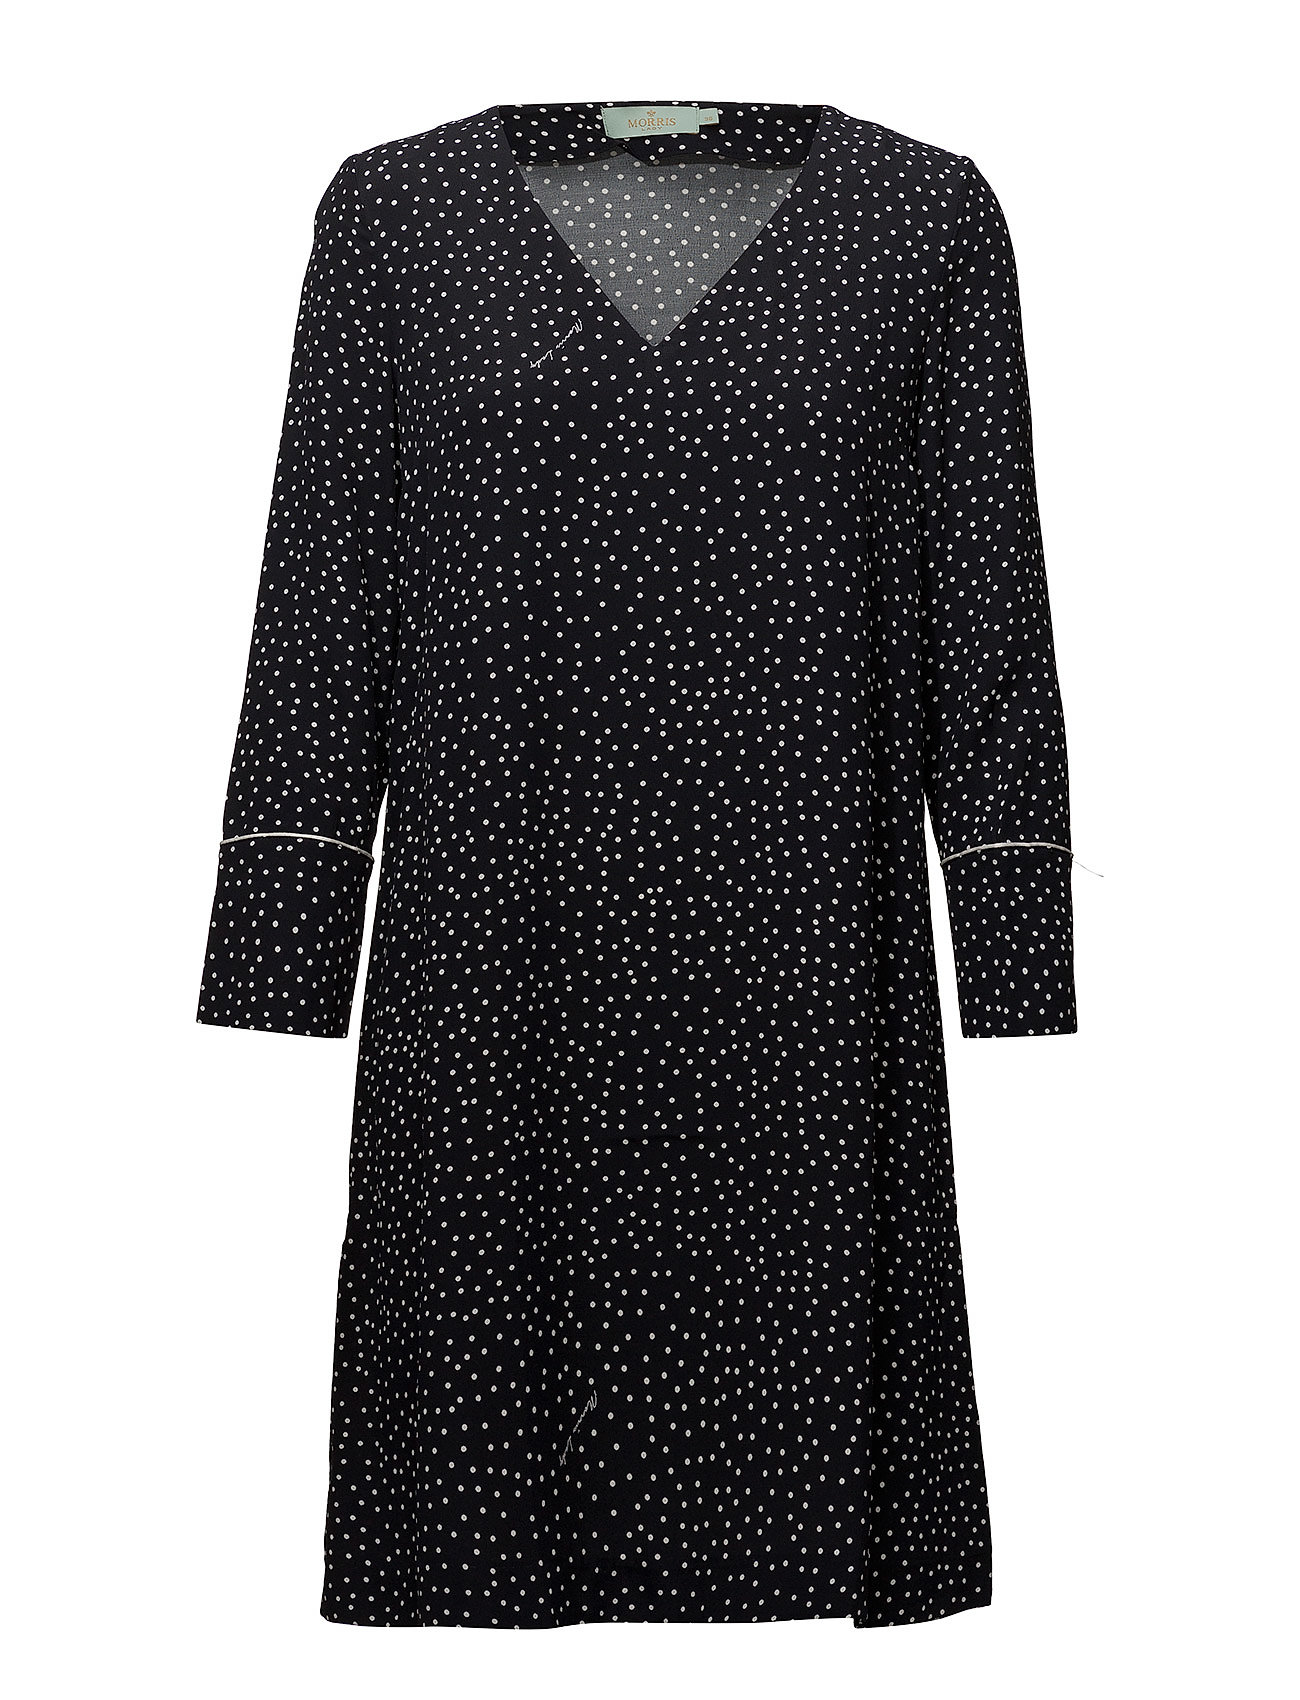 Morris Lady Éve Print Dress - BLACK